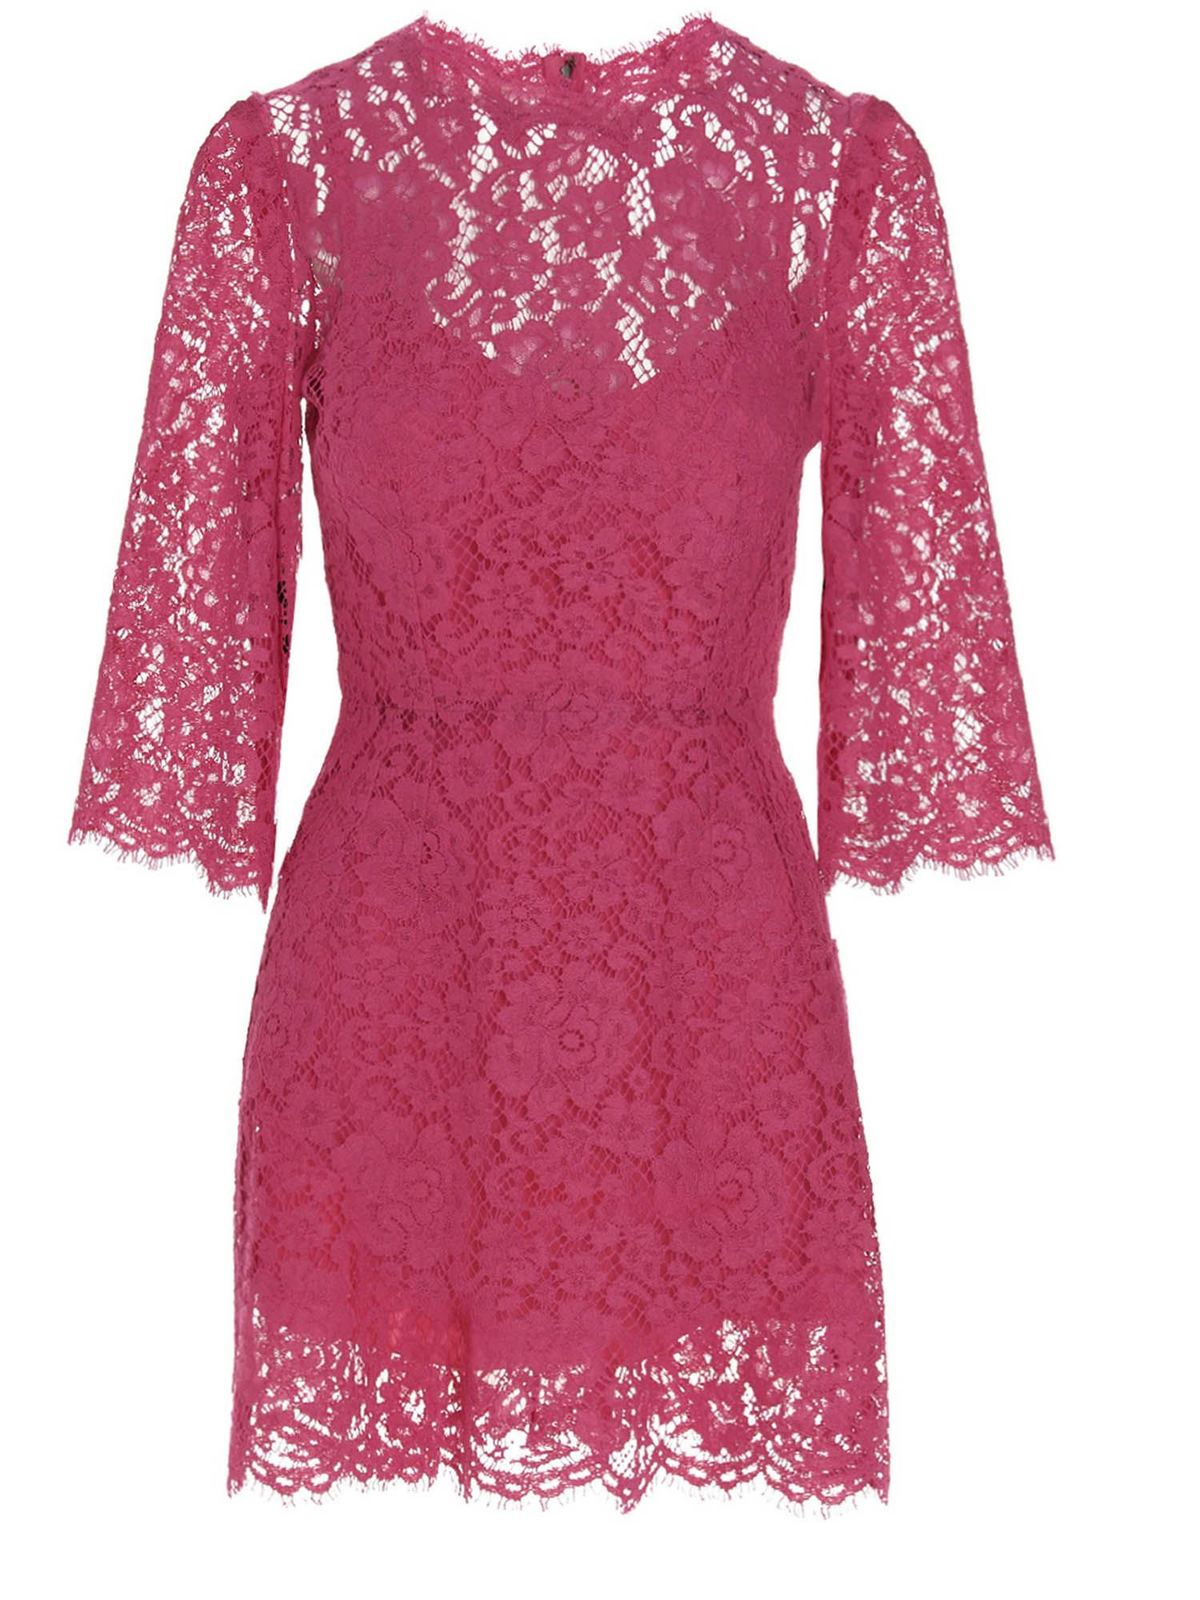 Dolce & Gabbana Cottons LACE DRESS IN FUCHSIA